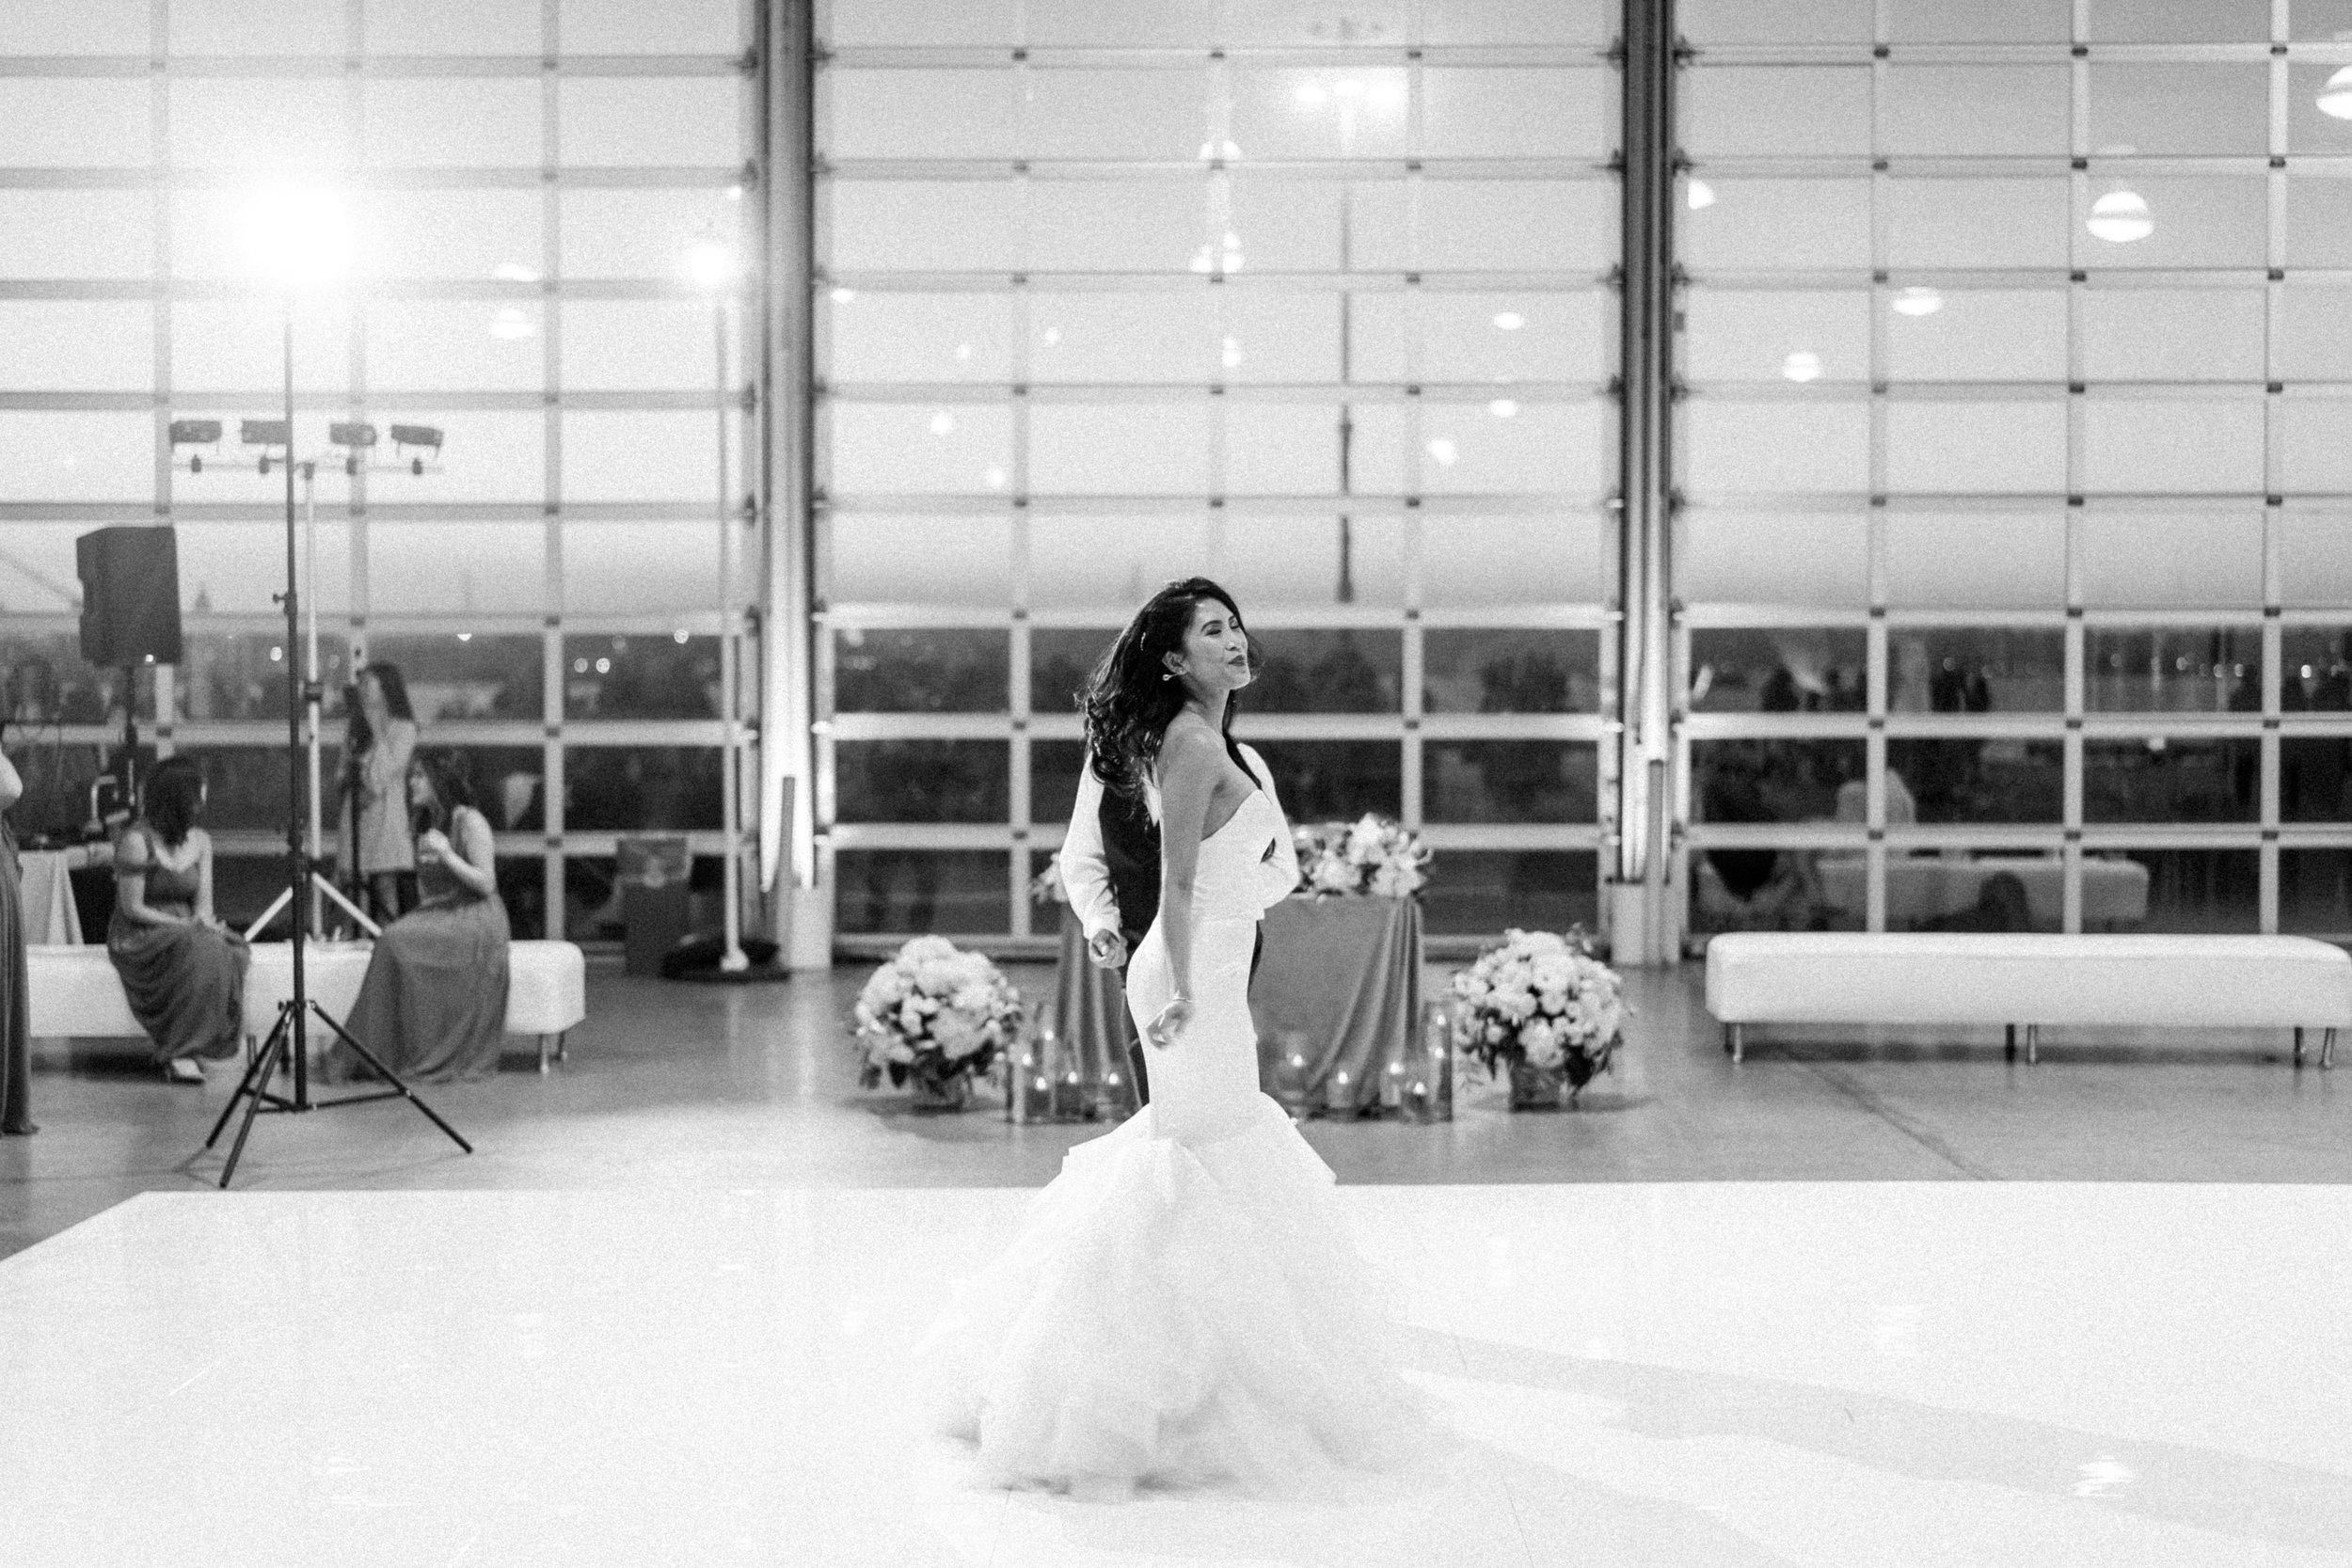 961 Anna _ Danny Wedding SUP09672.jpg